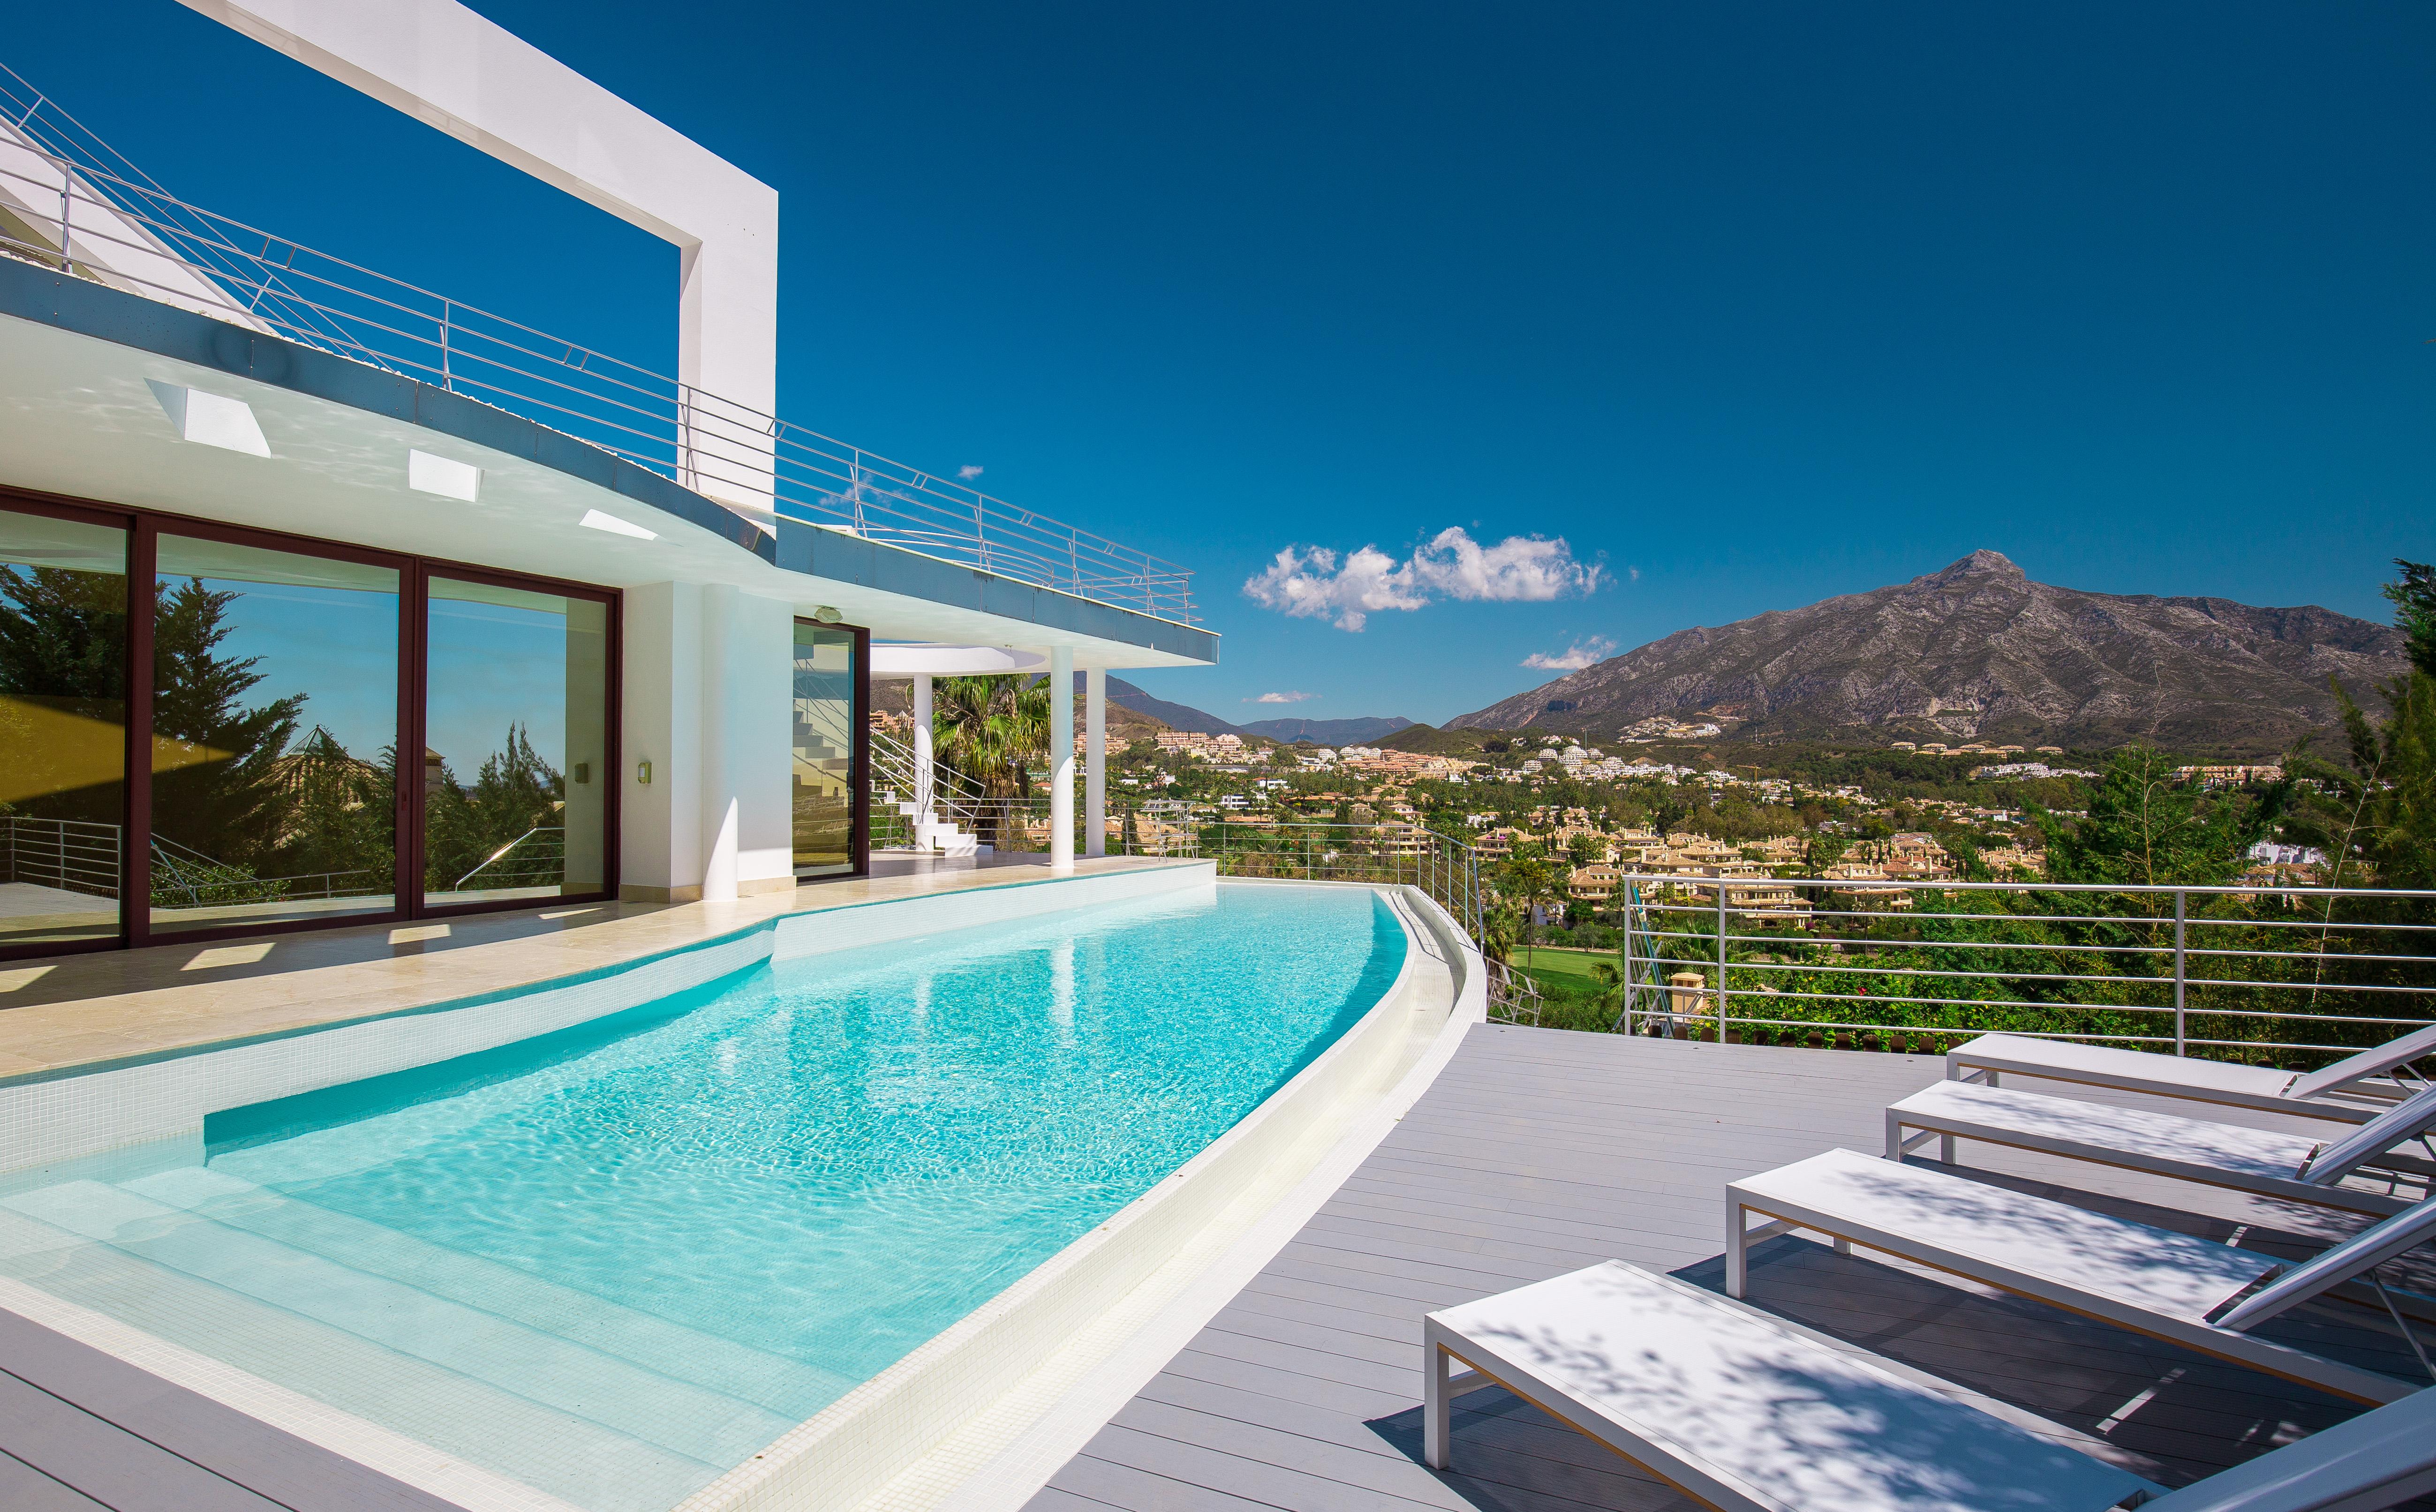 International press focus on Spanish Real Estate